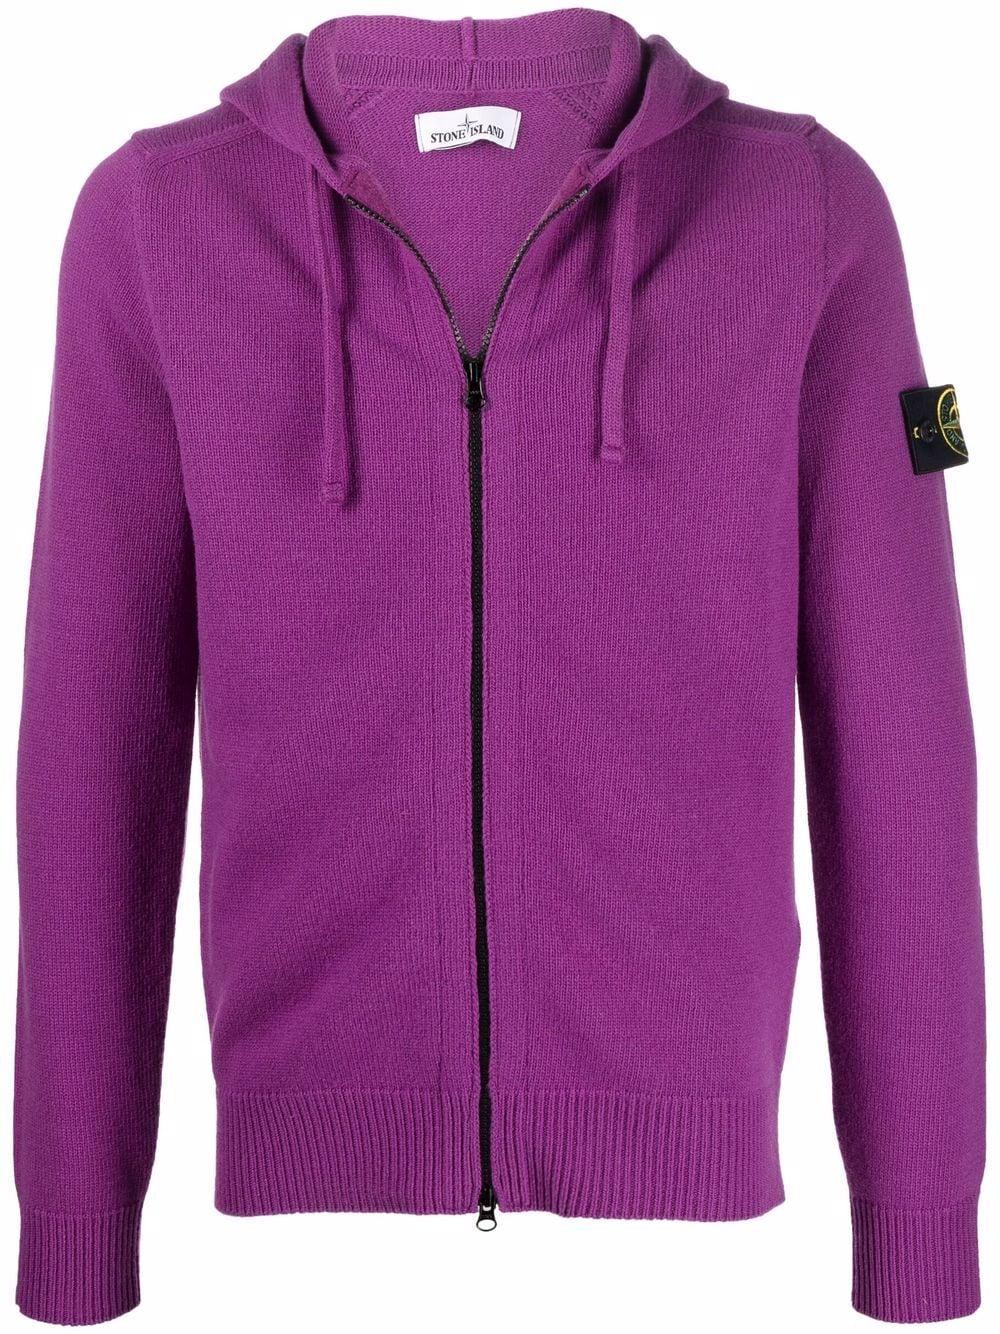 Felpa viola magenta in lana con cappuccio con logo Stone Island STONE ISLAND | Cardigan | 7515546A3V0045